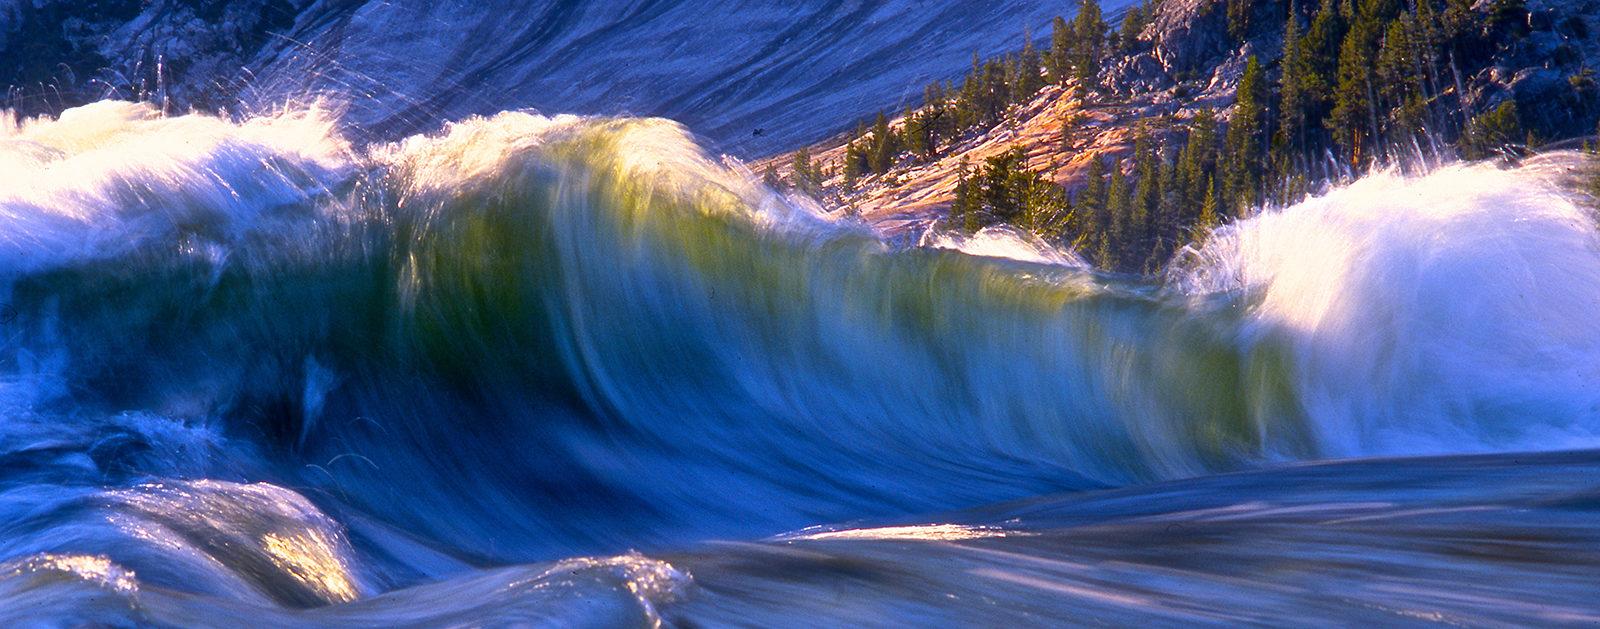 Brink of Glen Aulin Falls, Tuolumne River, CA. | Photo: Tim Palmer